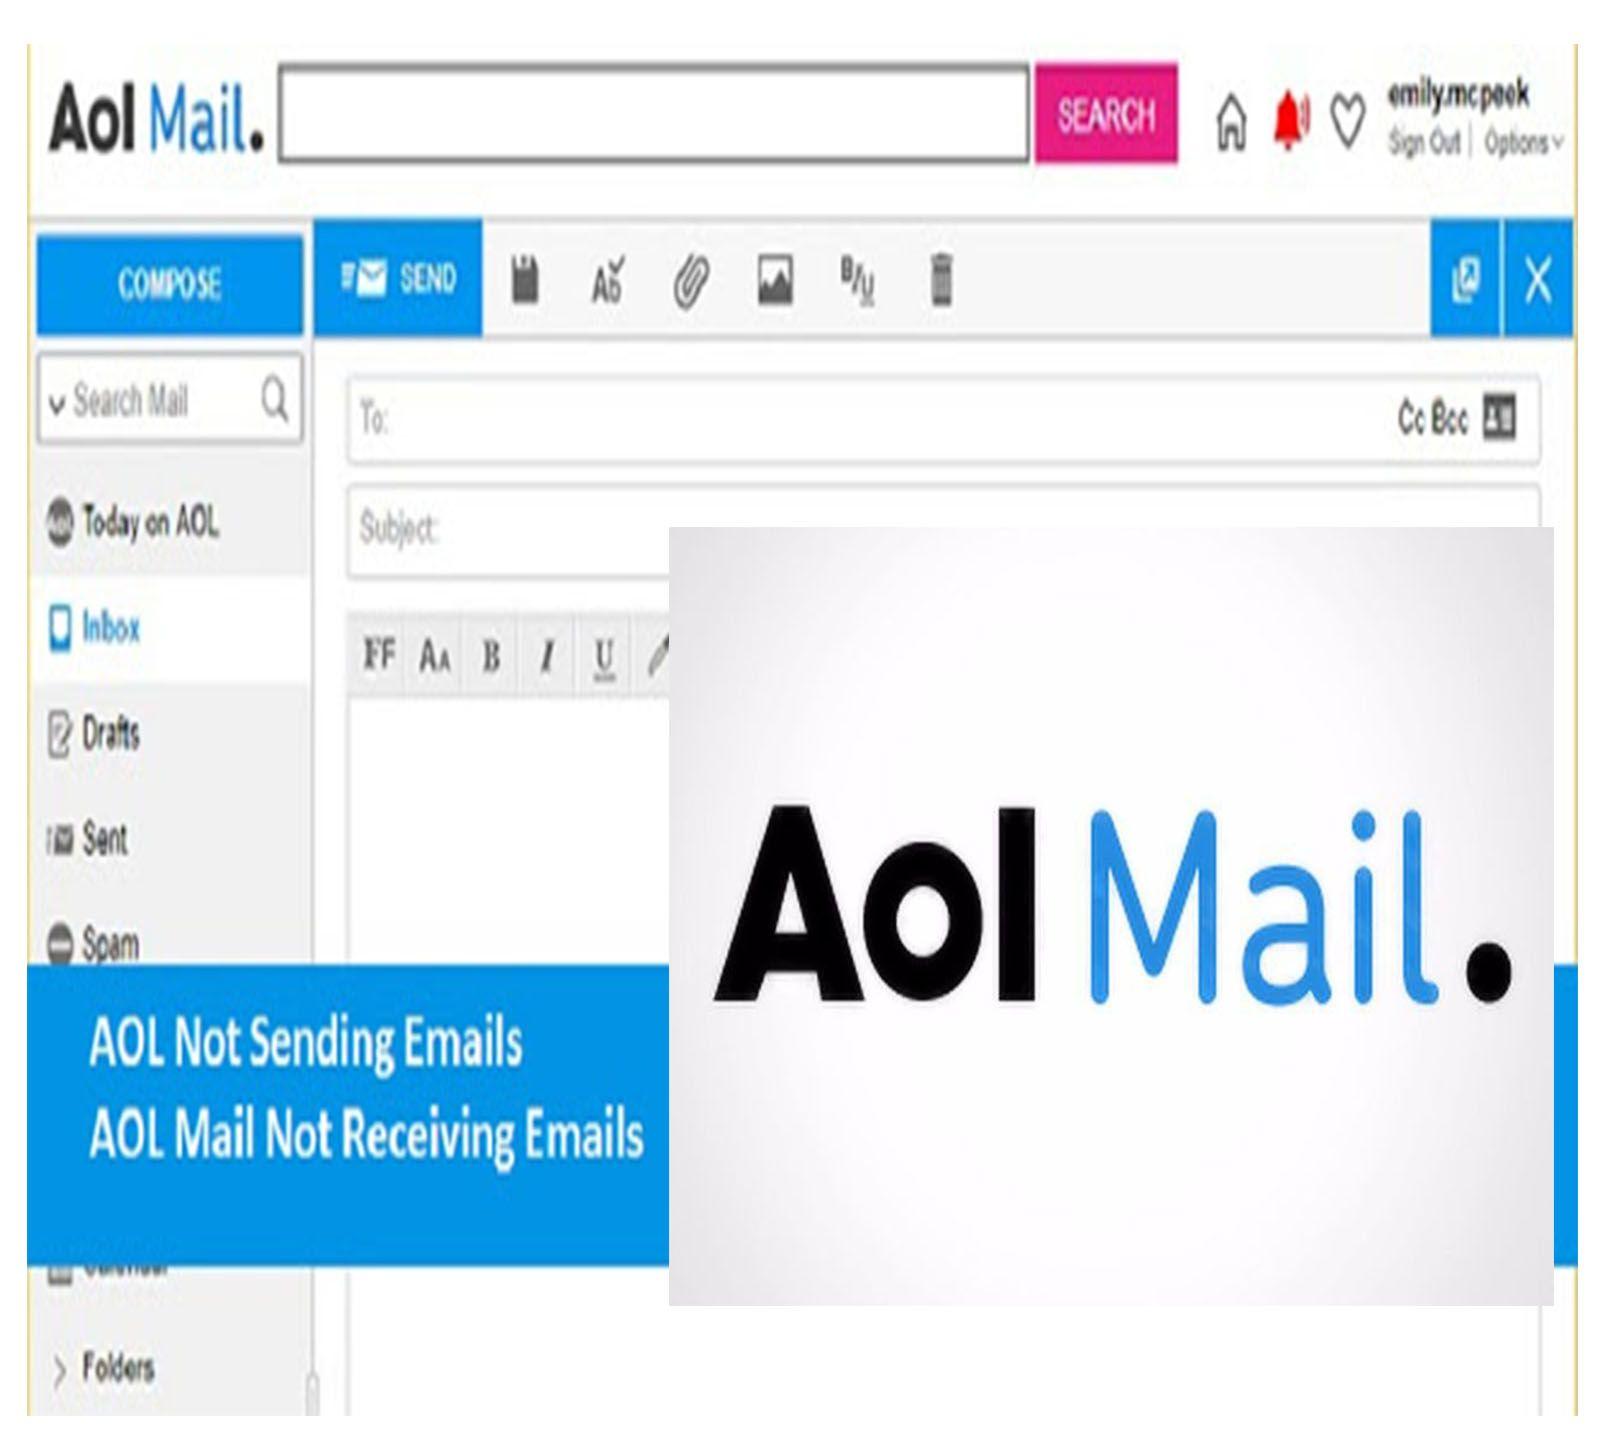 aol mail login site aol mail down my aol mail login screen